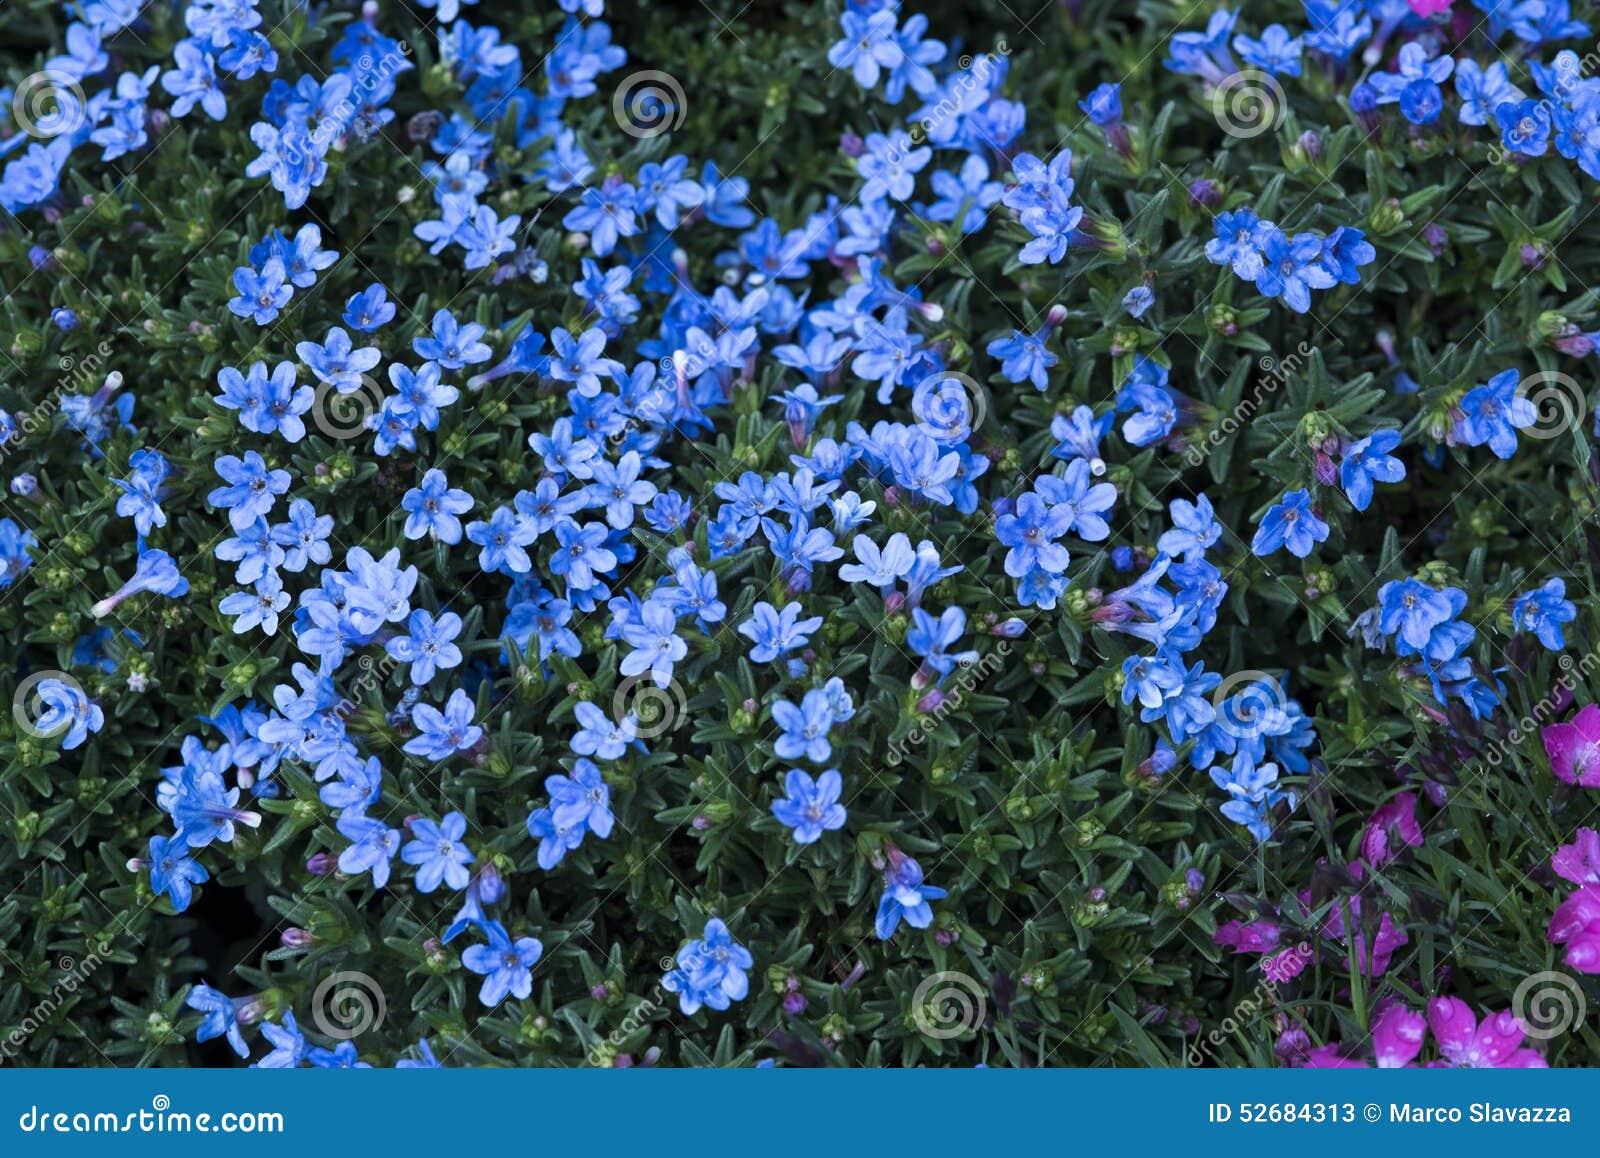 petites fleurs bleues photo stock image 52684313. Black Bedroom Furniture Sets. Home Design Ideas